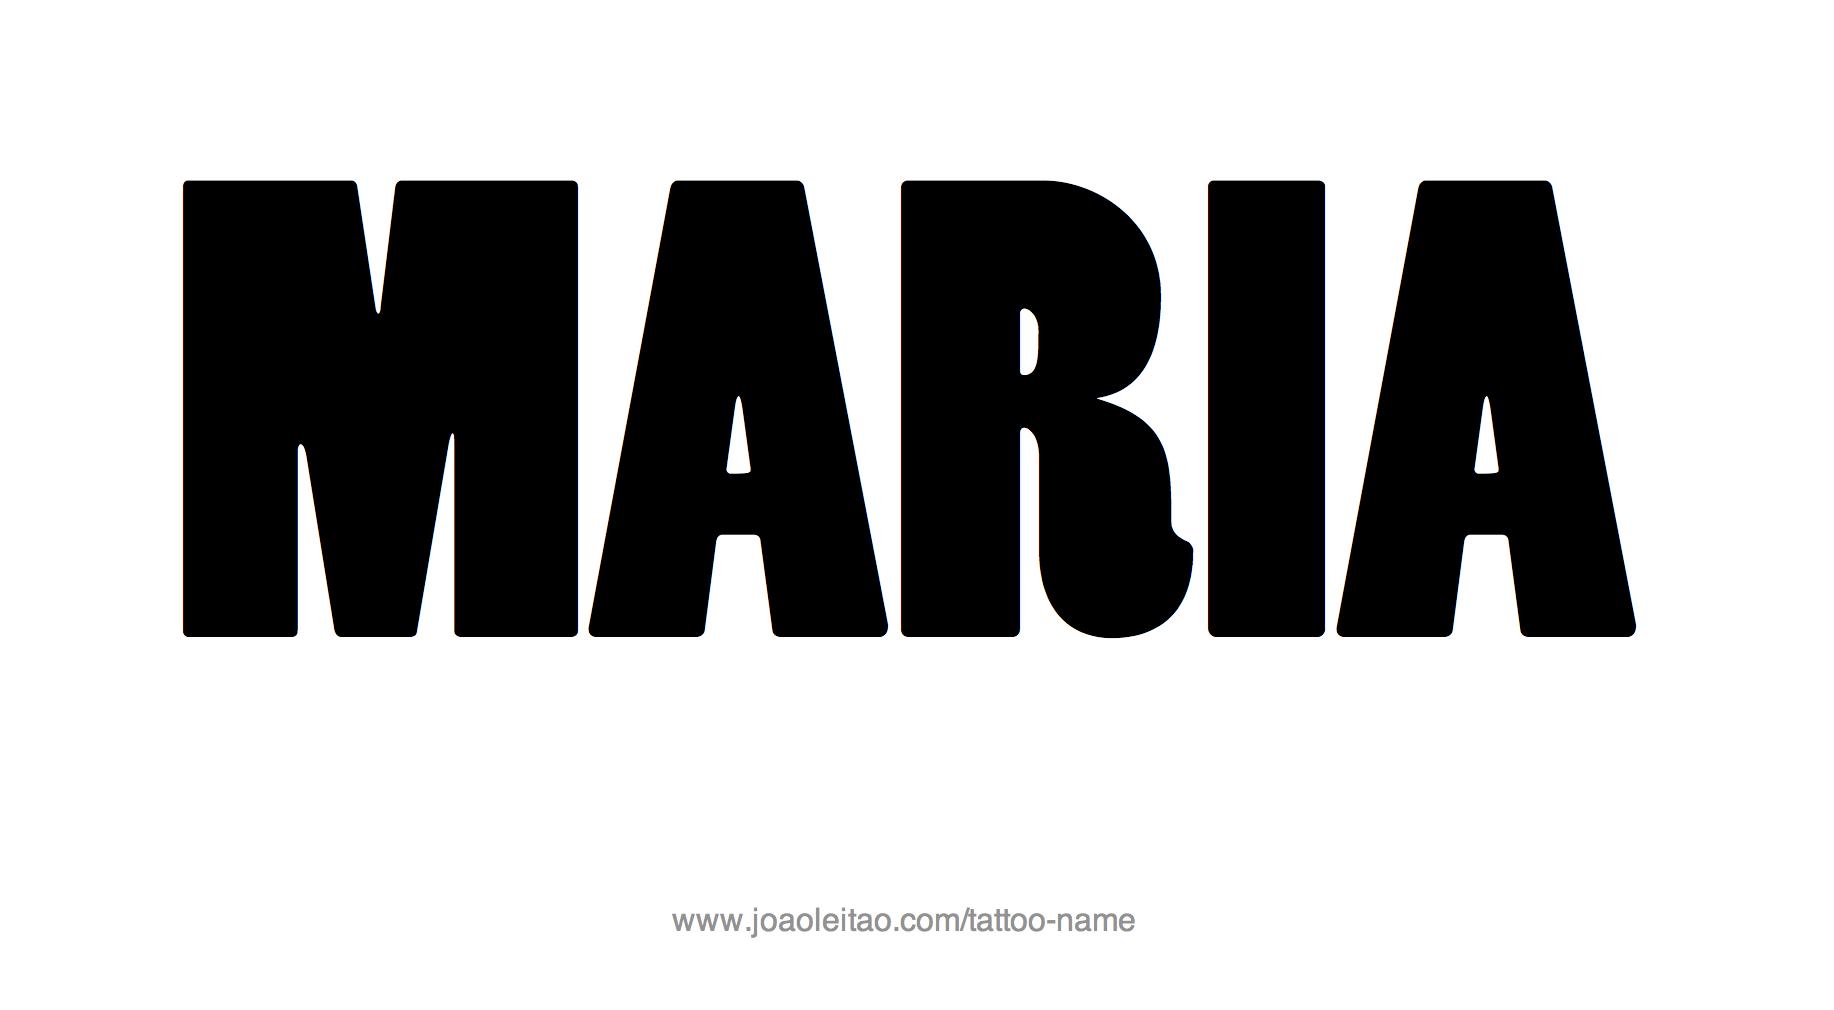 tattoo design female name maria 10 png. Black Bedroom Furniture Sets. Home Design Ideas